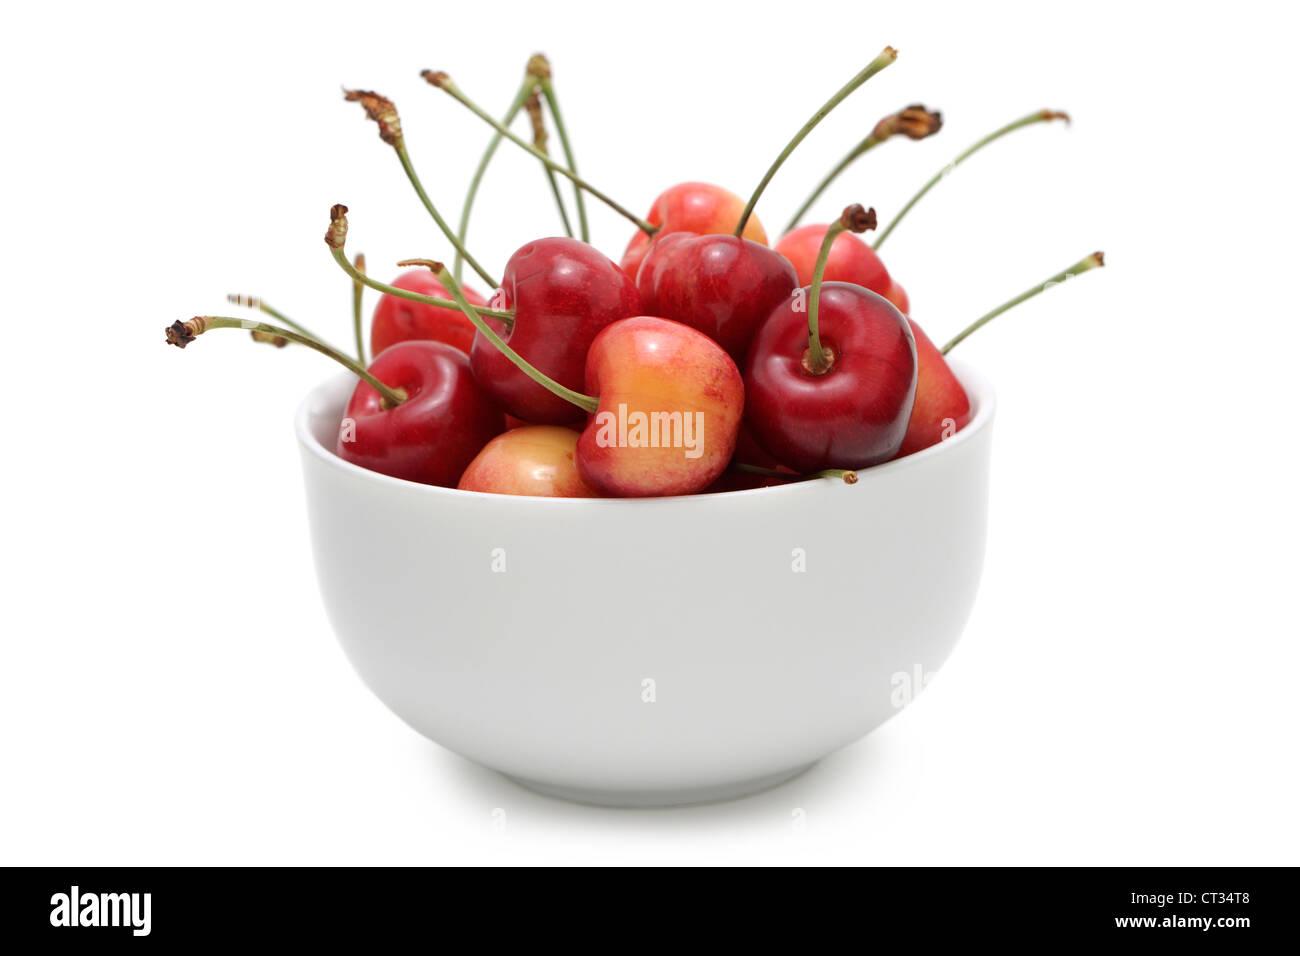 Cherries in a Bowl, Bowl of Rainier Cherries - Stock Image